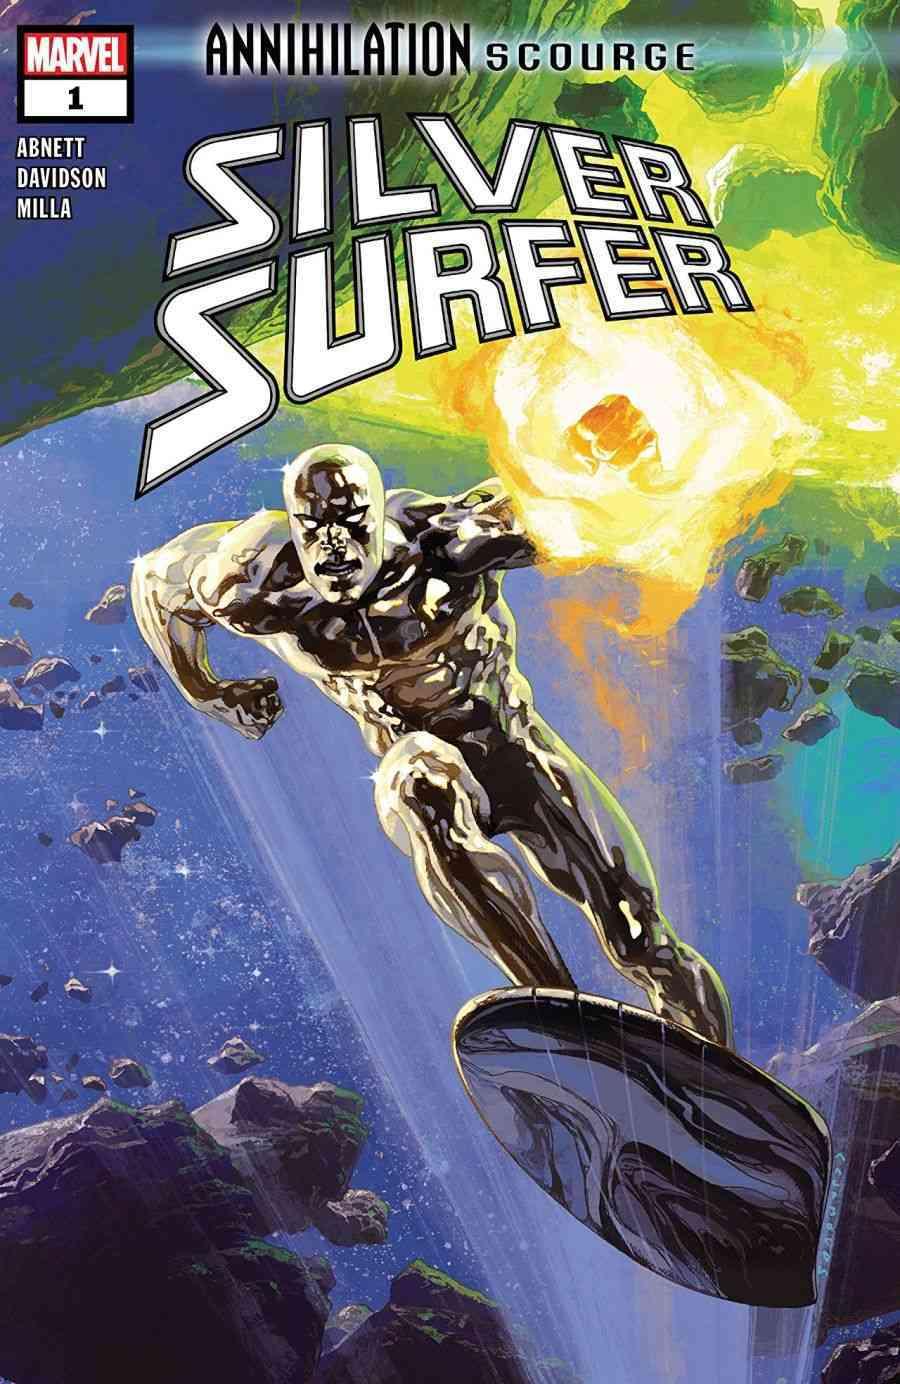 Annihilation - Scourge Silver Surfer